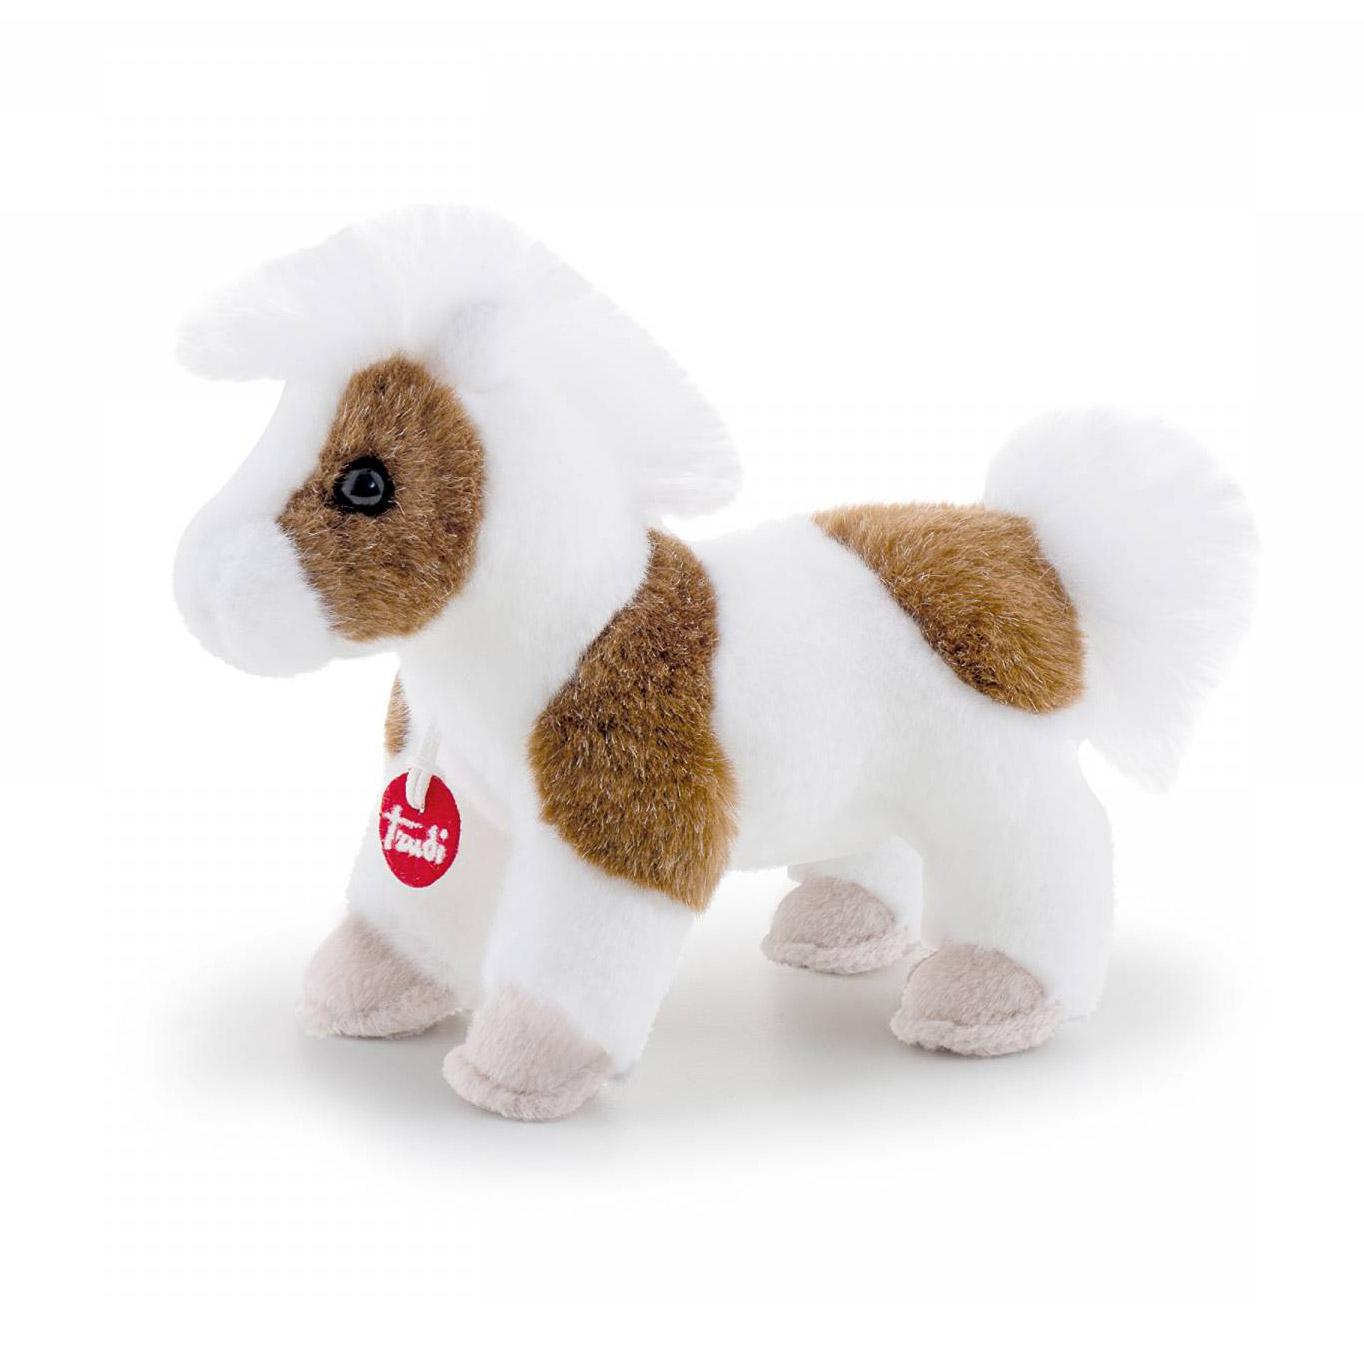 Мягкая игрушка Trudi Лошадка Делюкс 15 см мягкая игрушка trudi заяц белый 28 см